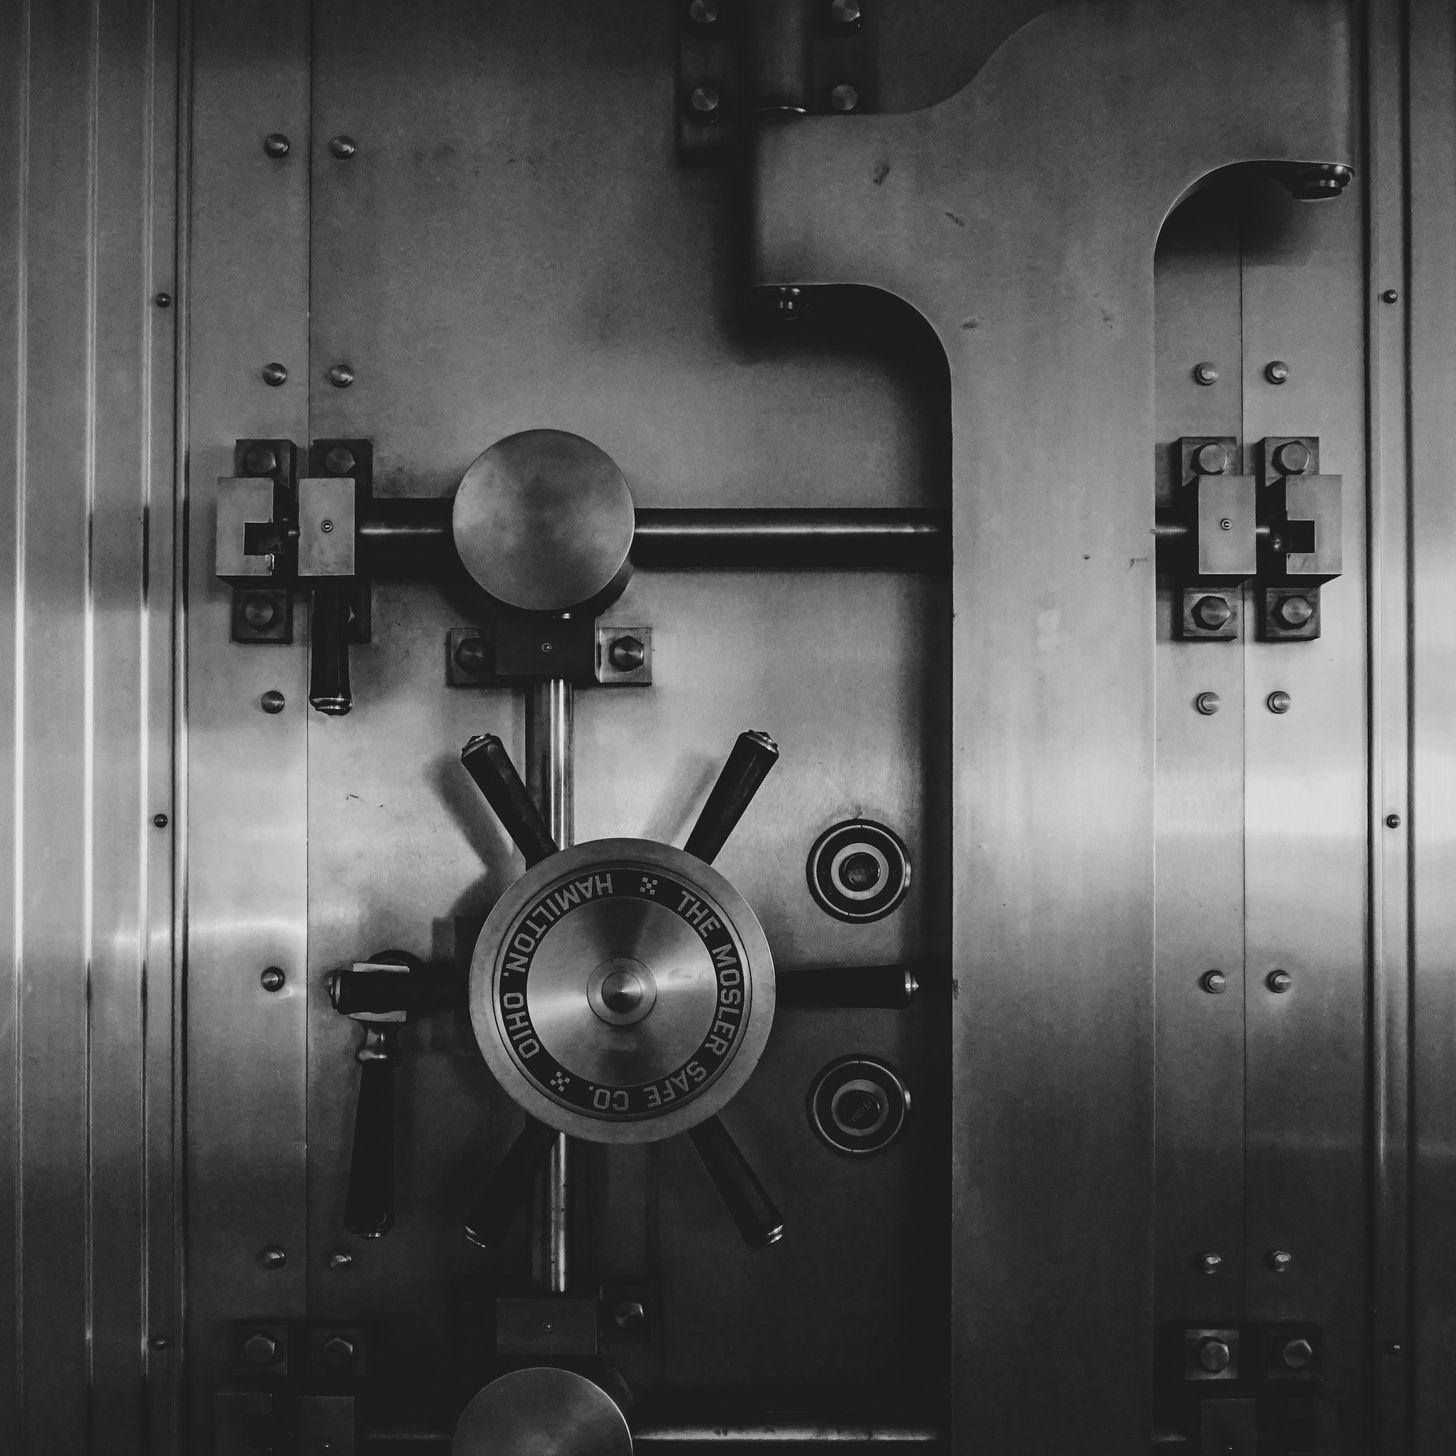 safe_security_stock.jpg